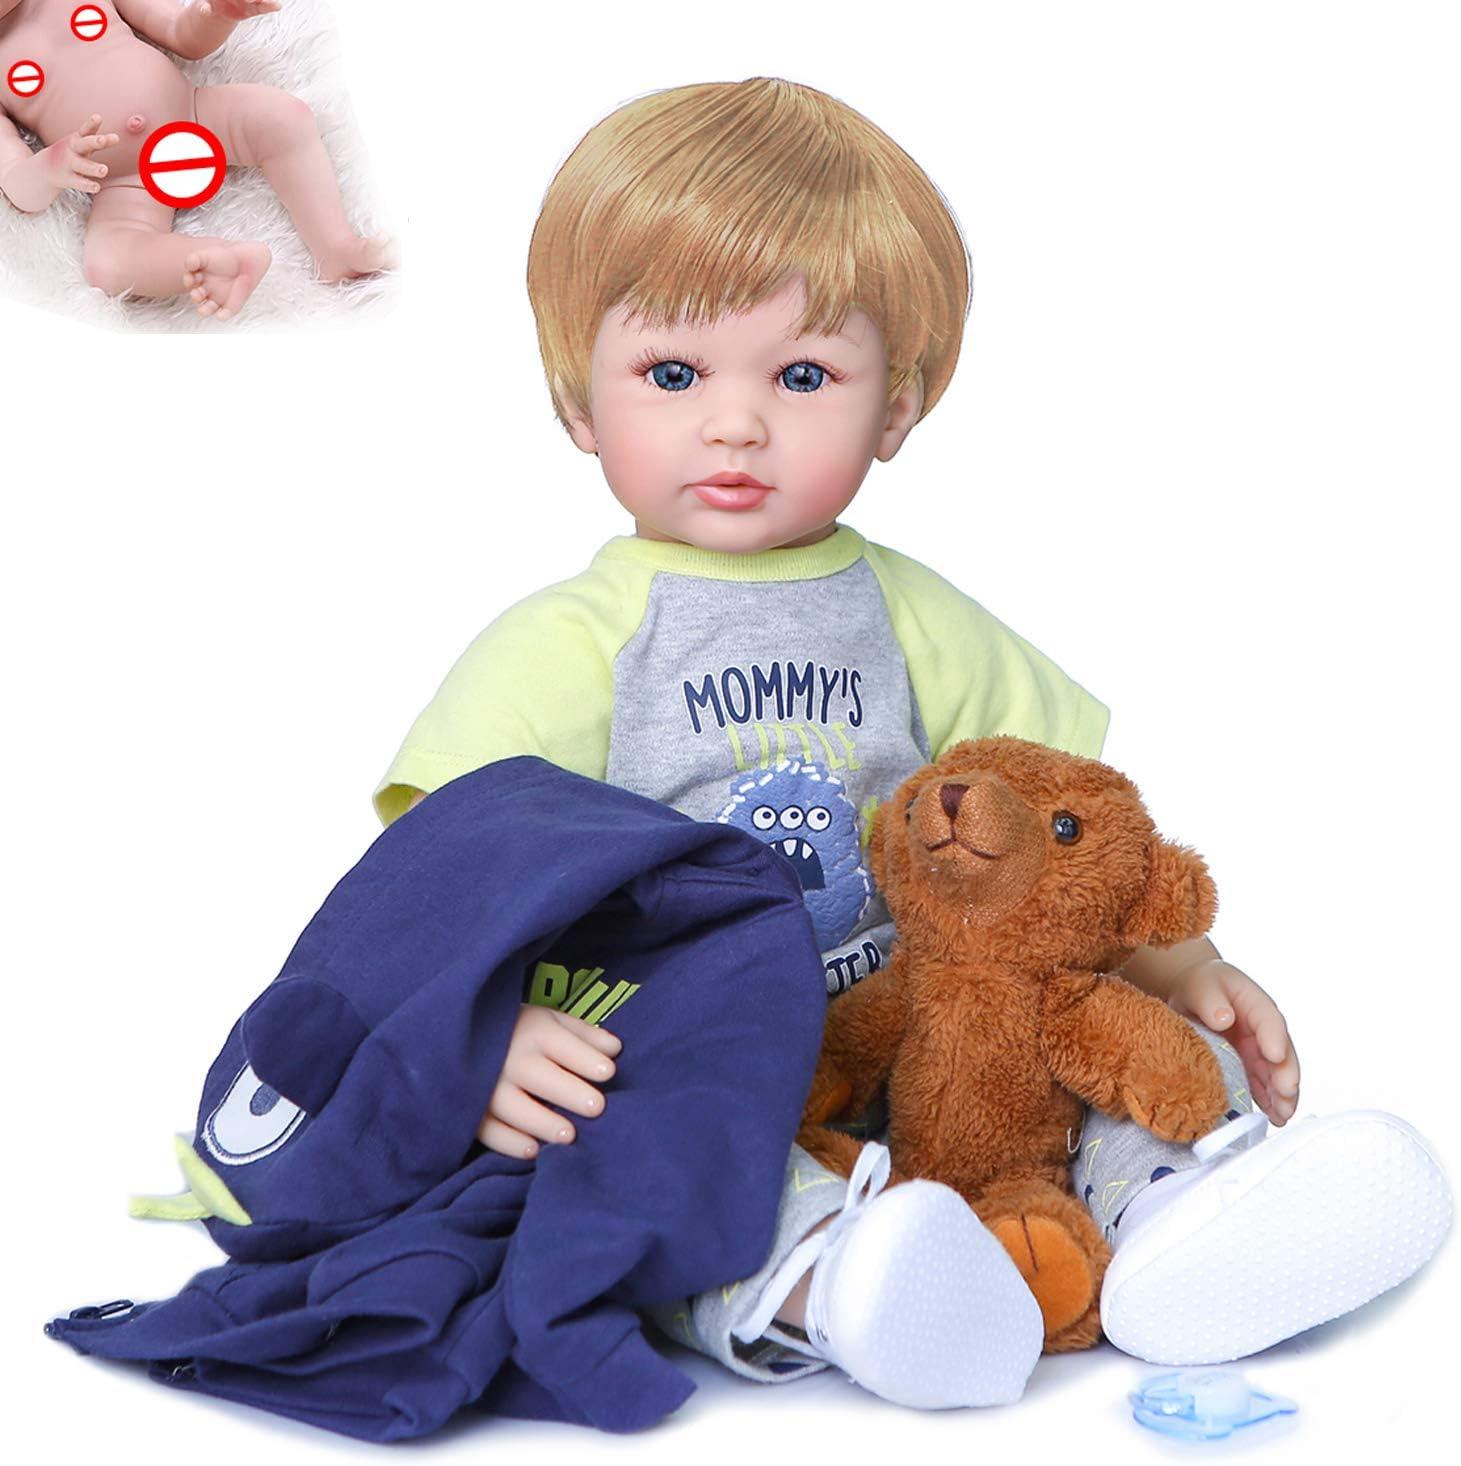 24 ClothBody-BrownHair iCradle Lifelike Reborn Baby Dolls 24 Inch 61cm Soft Cloth Body Realistic Reborn Toddler Real Babies Newborn Doll Kids Xmas Toy Gift